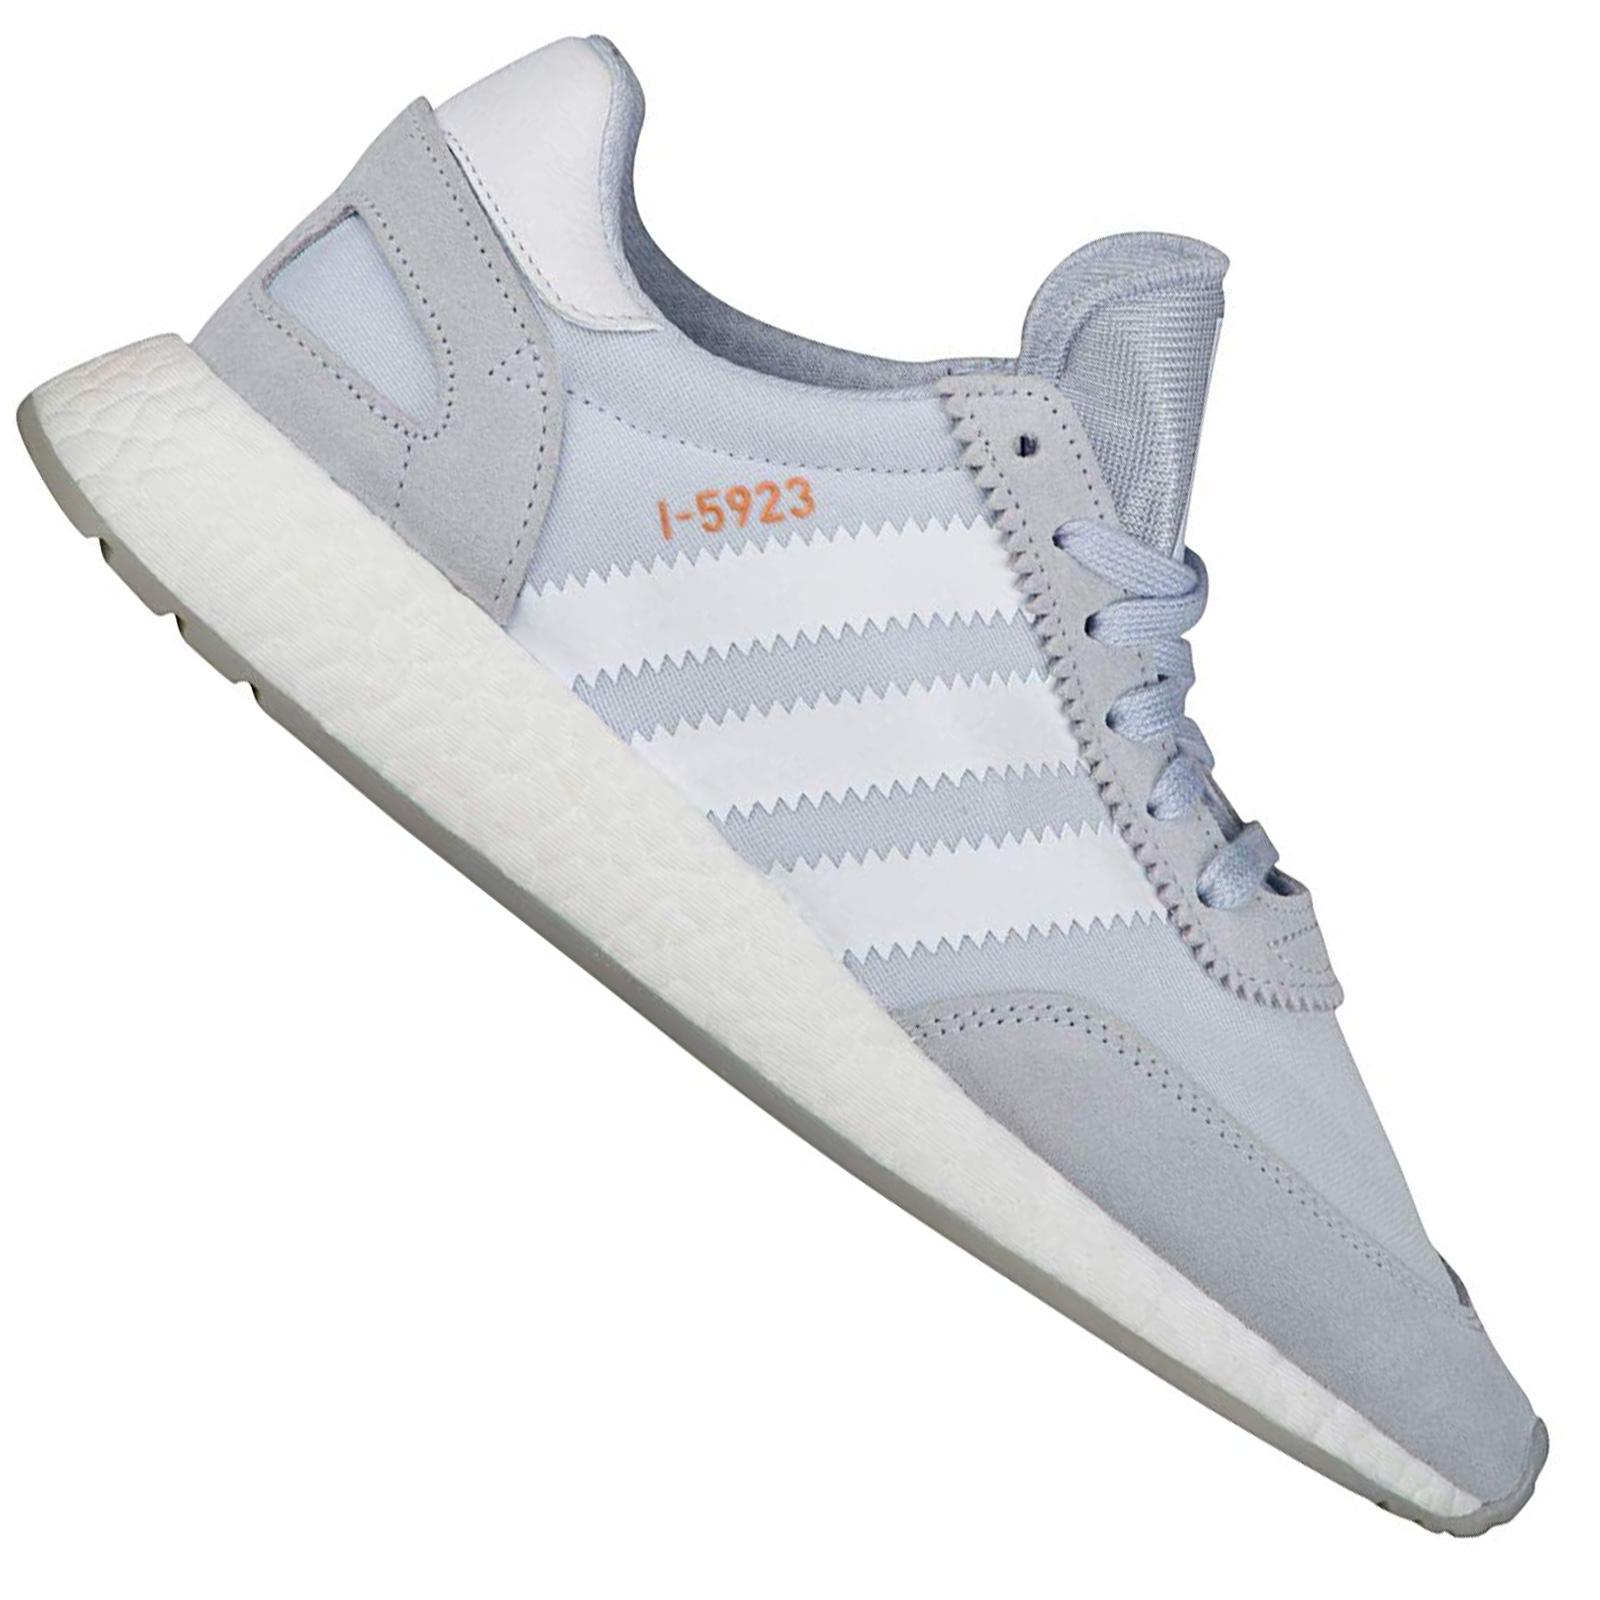 Runner 5923 Schuhe Aero Turnschuhe Damen Blue I Sneaker Iniki Adidas wPiOXuZkT